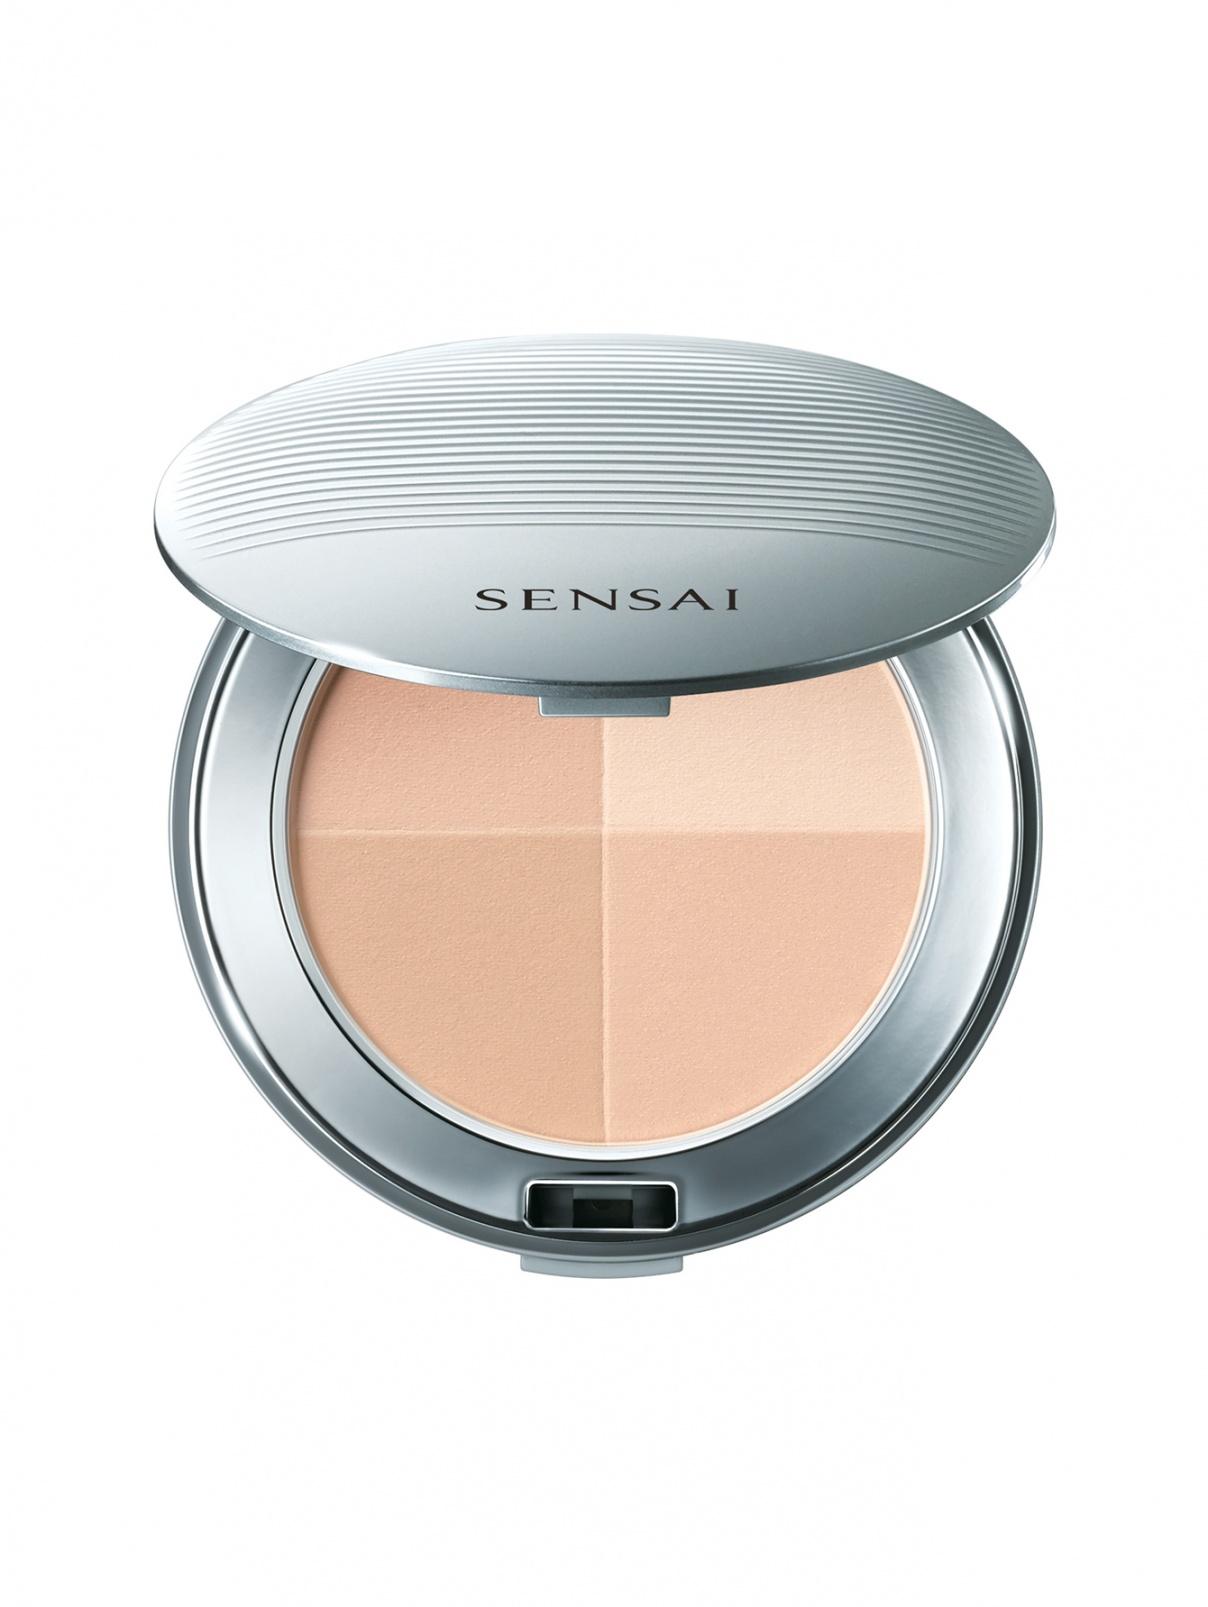 SENSAI CELLULAR PERFORMANCE Компактная пудра для лица 8 г Sensai  –  Общий вид